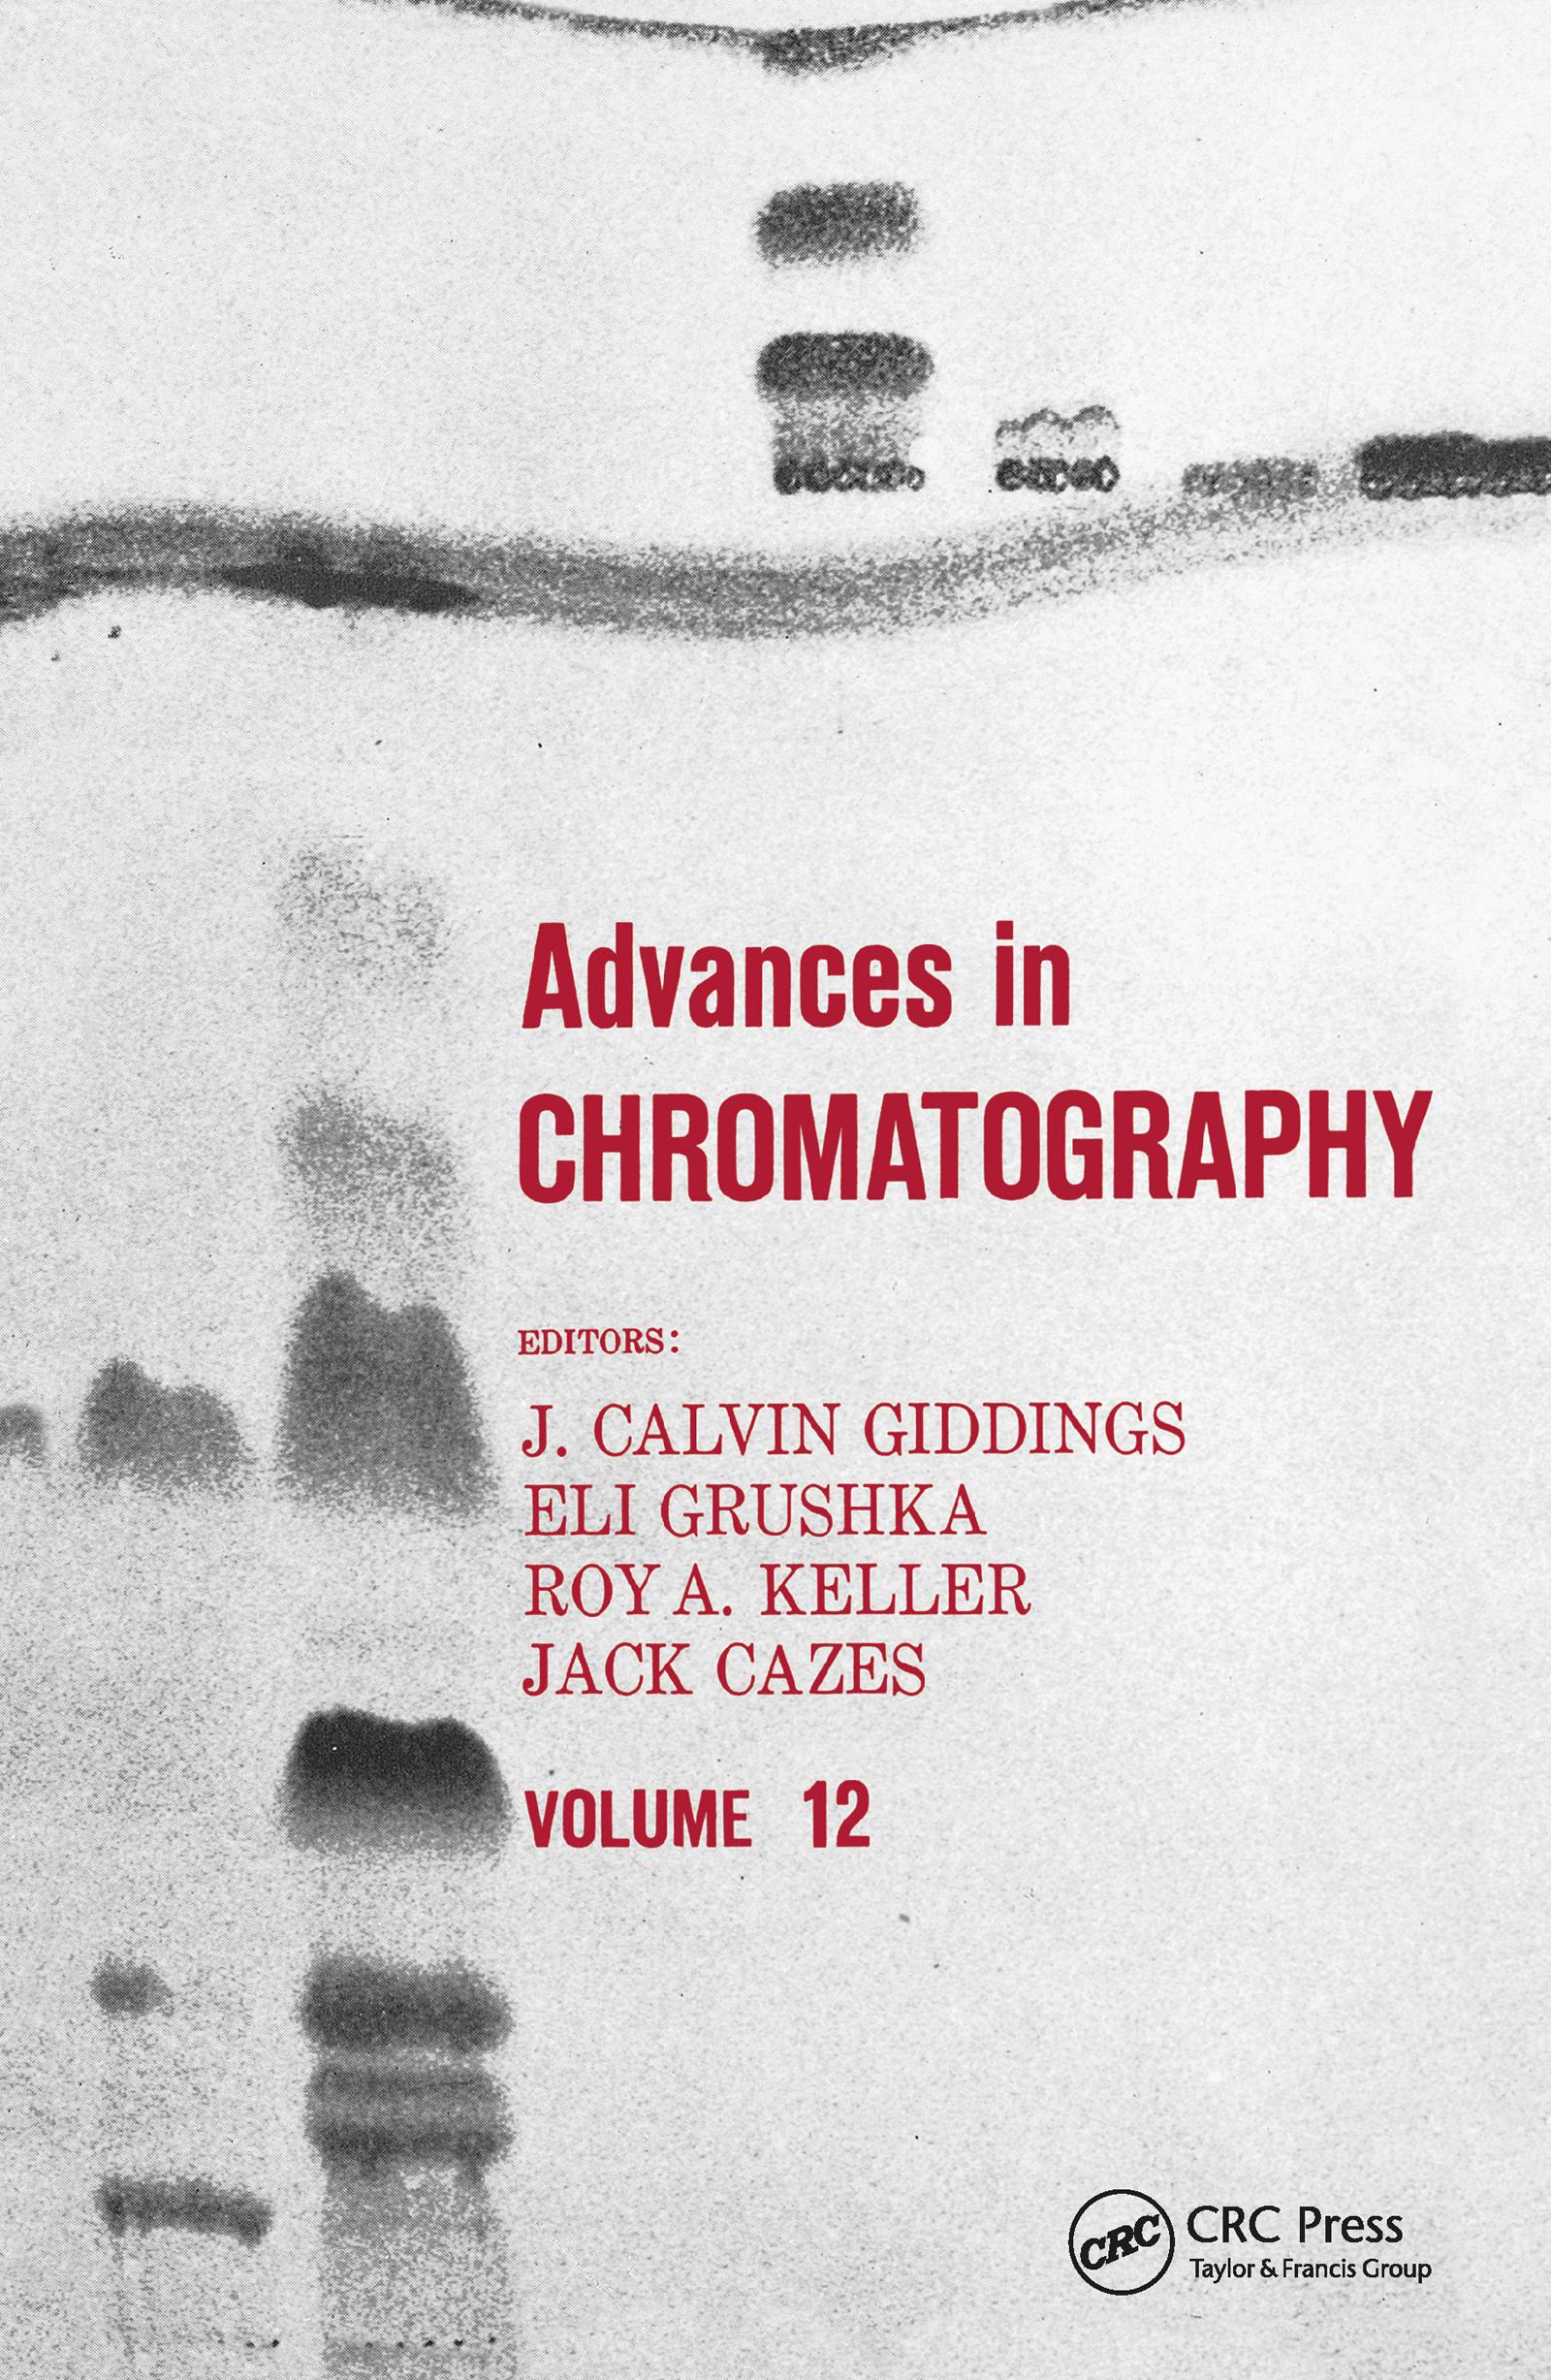 Advances in Chromatography: Volume 12, 1st Edition (Hardback) book cover